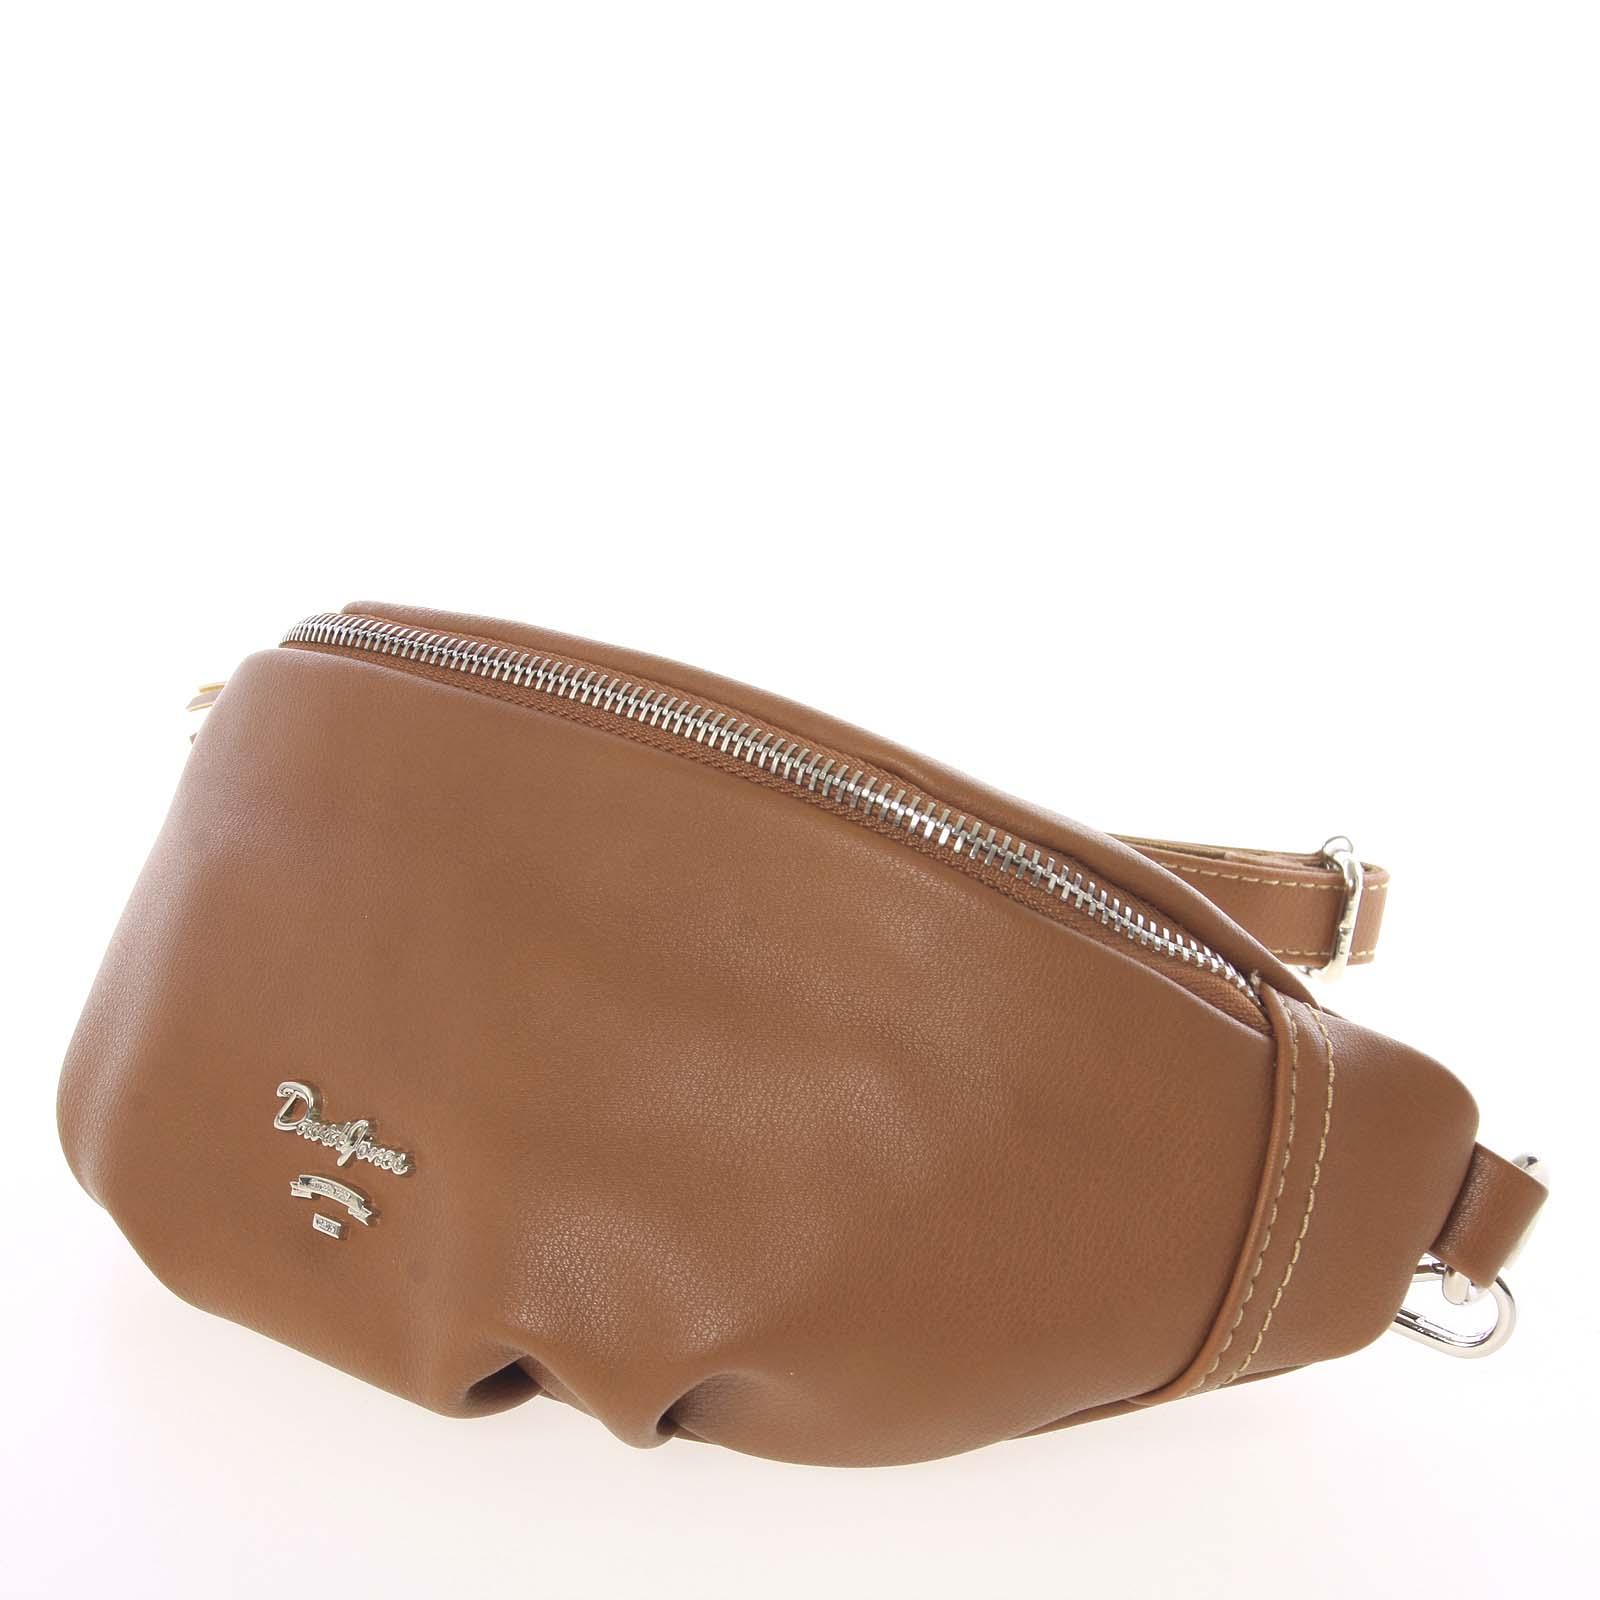 Vkusná tmavšia koňaková ľadvinková kabelka pre ženy - David Jones Kidney